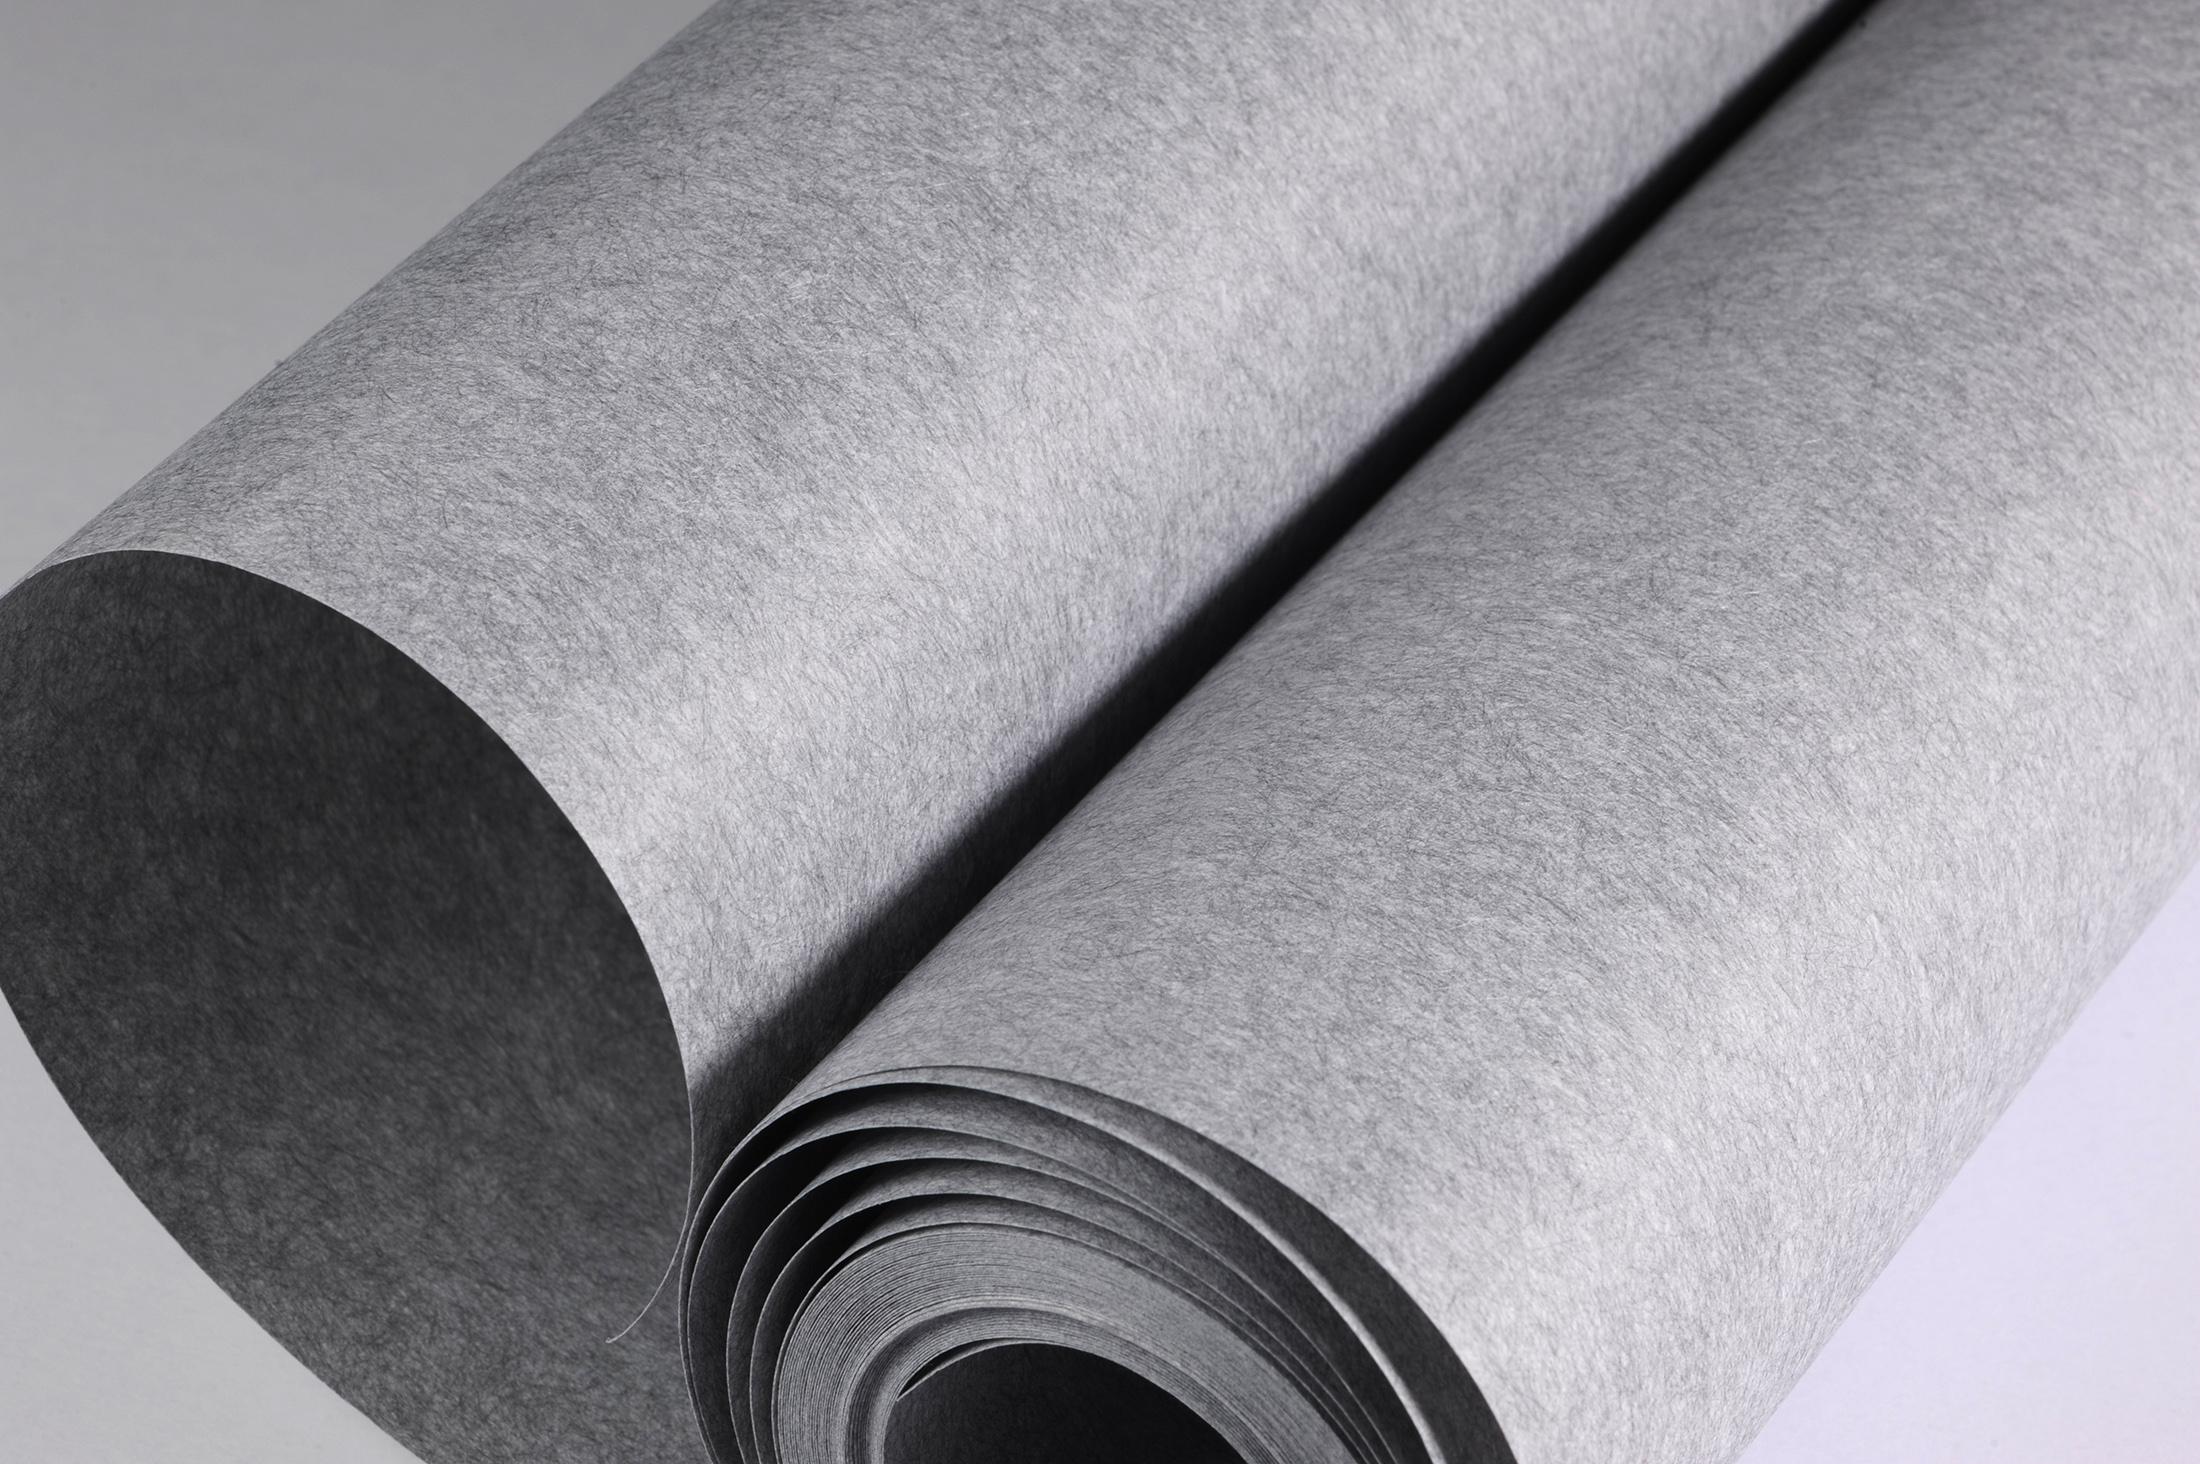 Guardia de papel tapiz